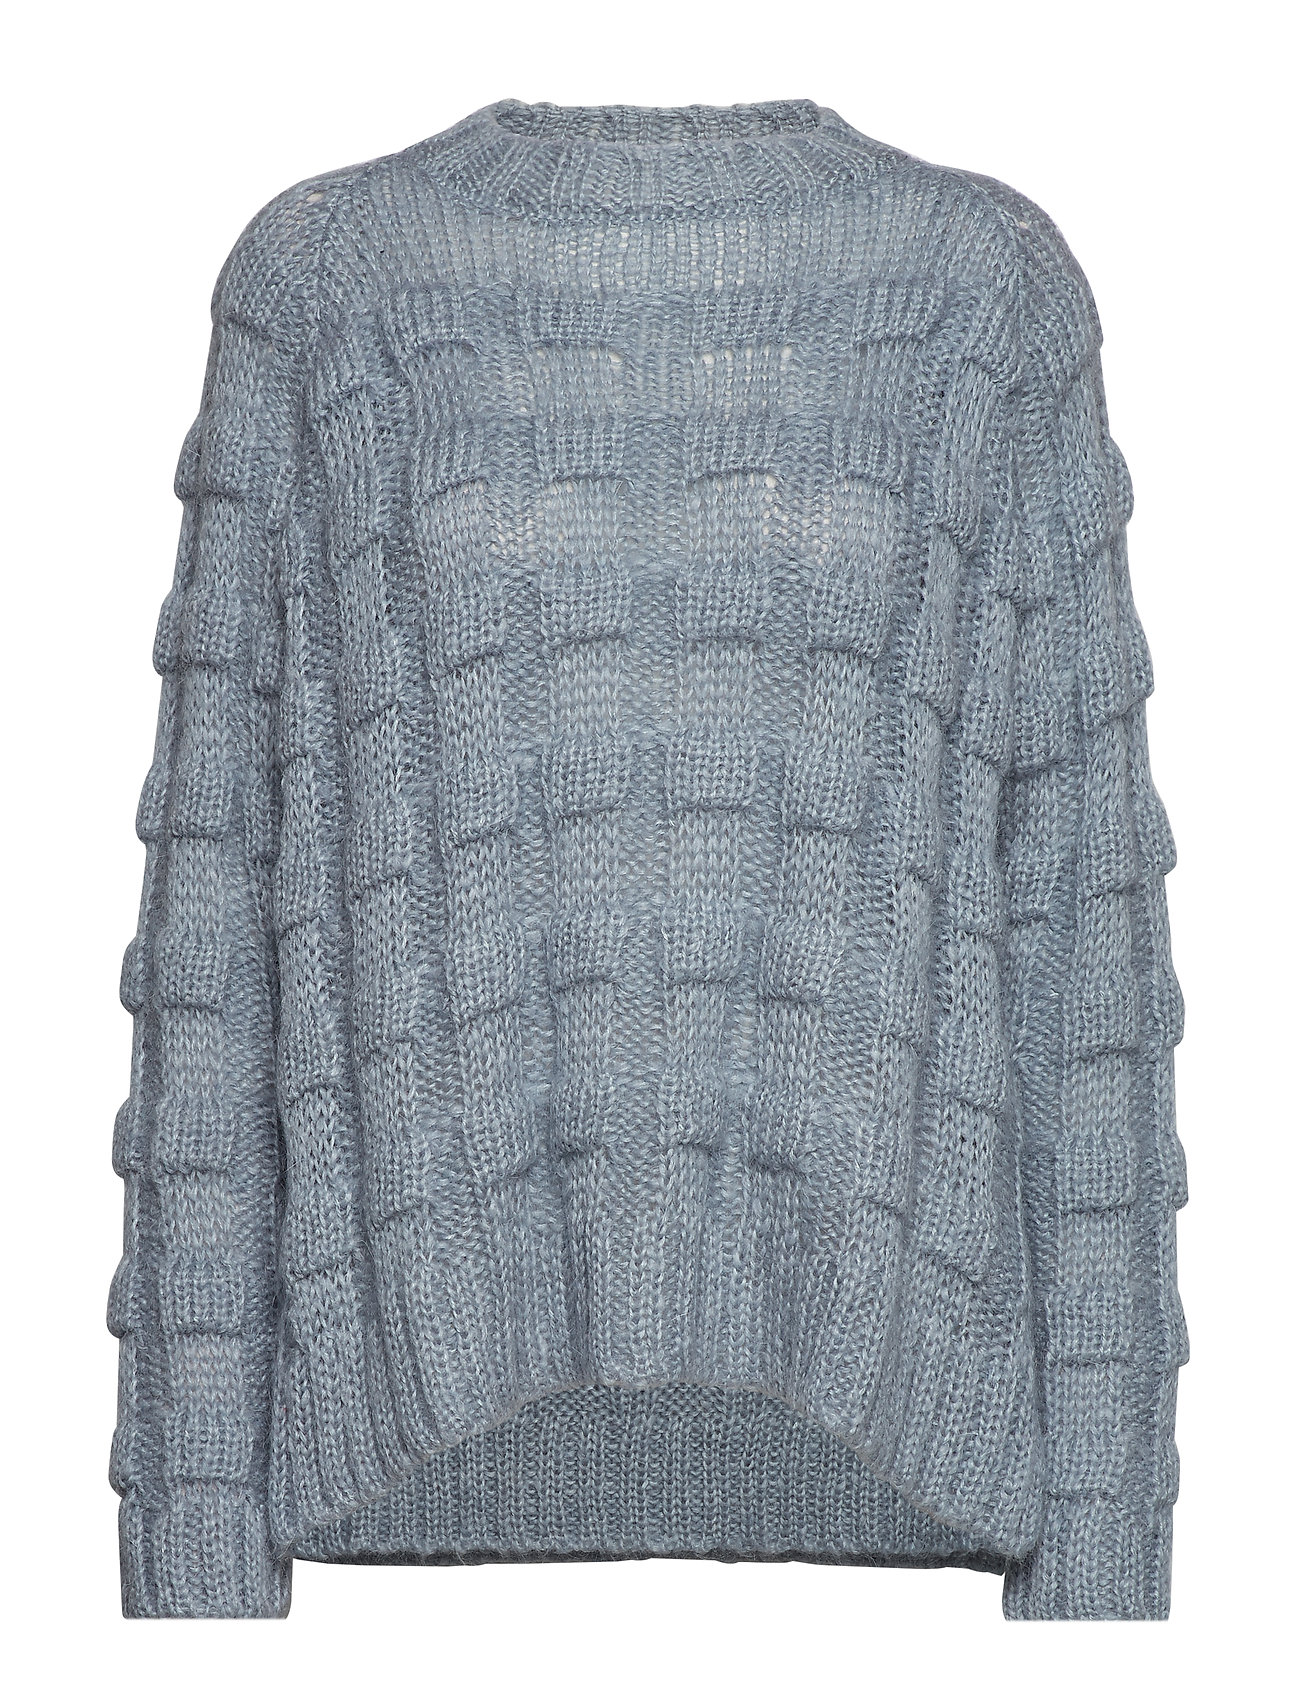 Sweaterice Saloner Boxy Knit BlueRabens Croc rWdCxBoe